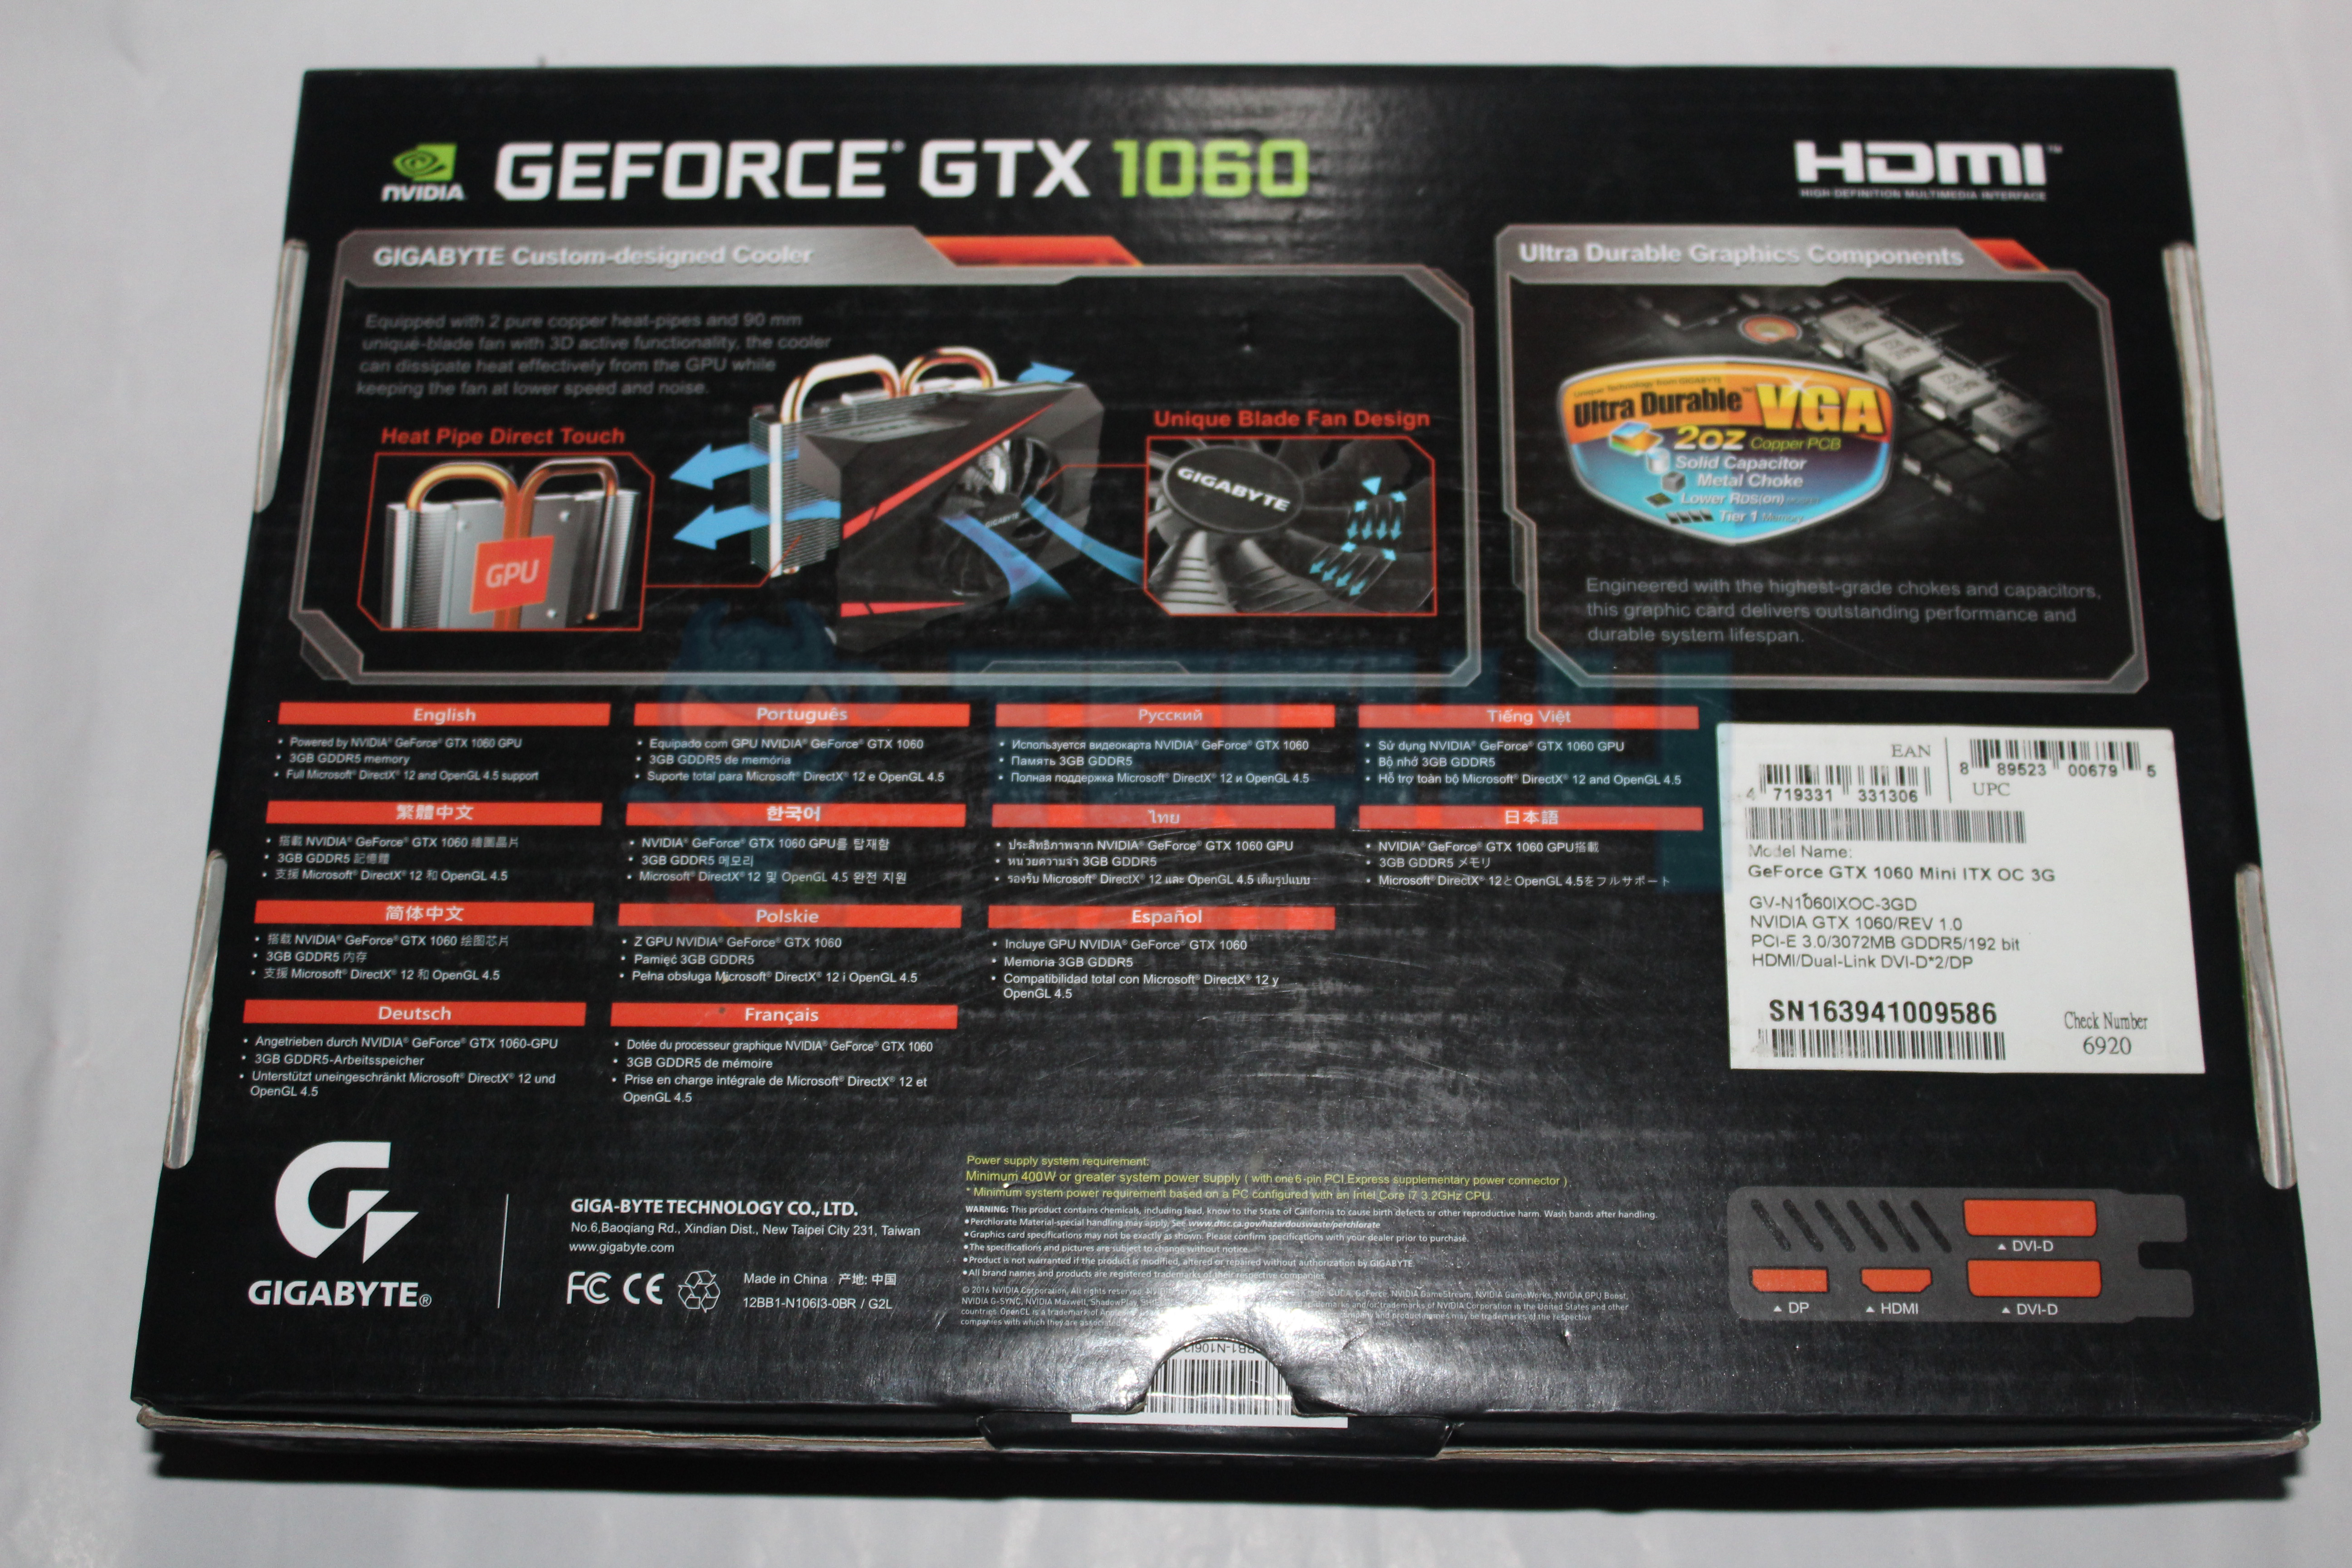 Gigabyte GTX 1060 Mini 3GB Graphics Card Review